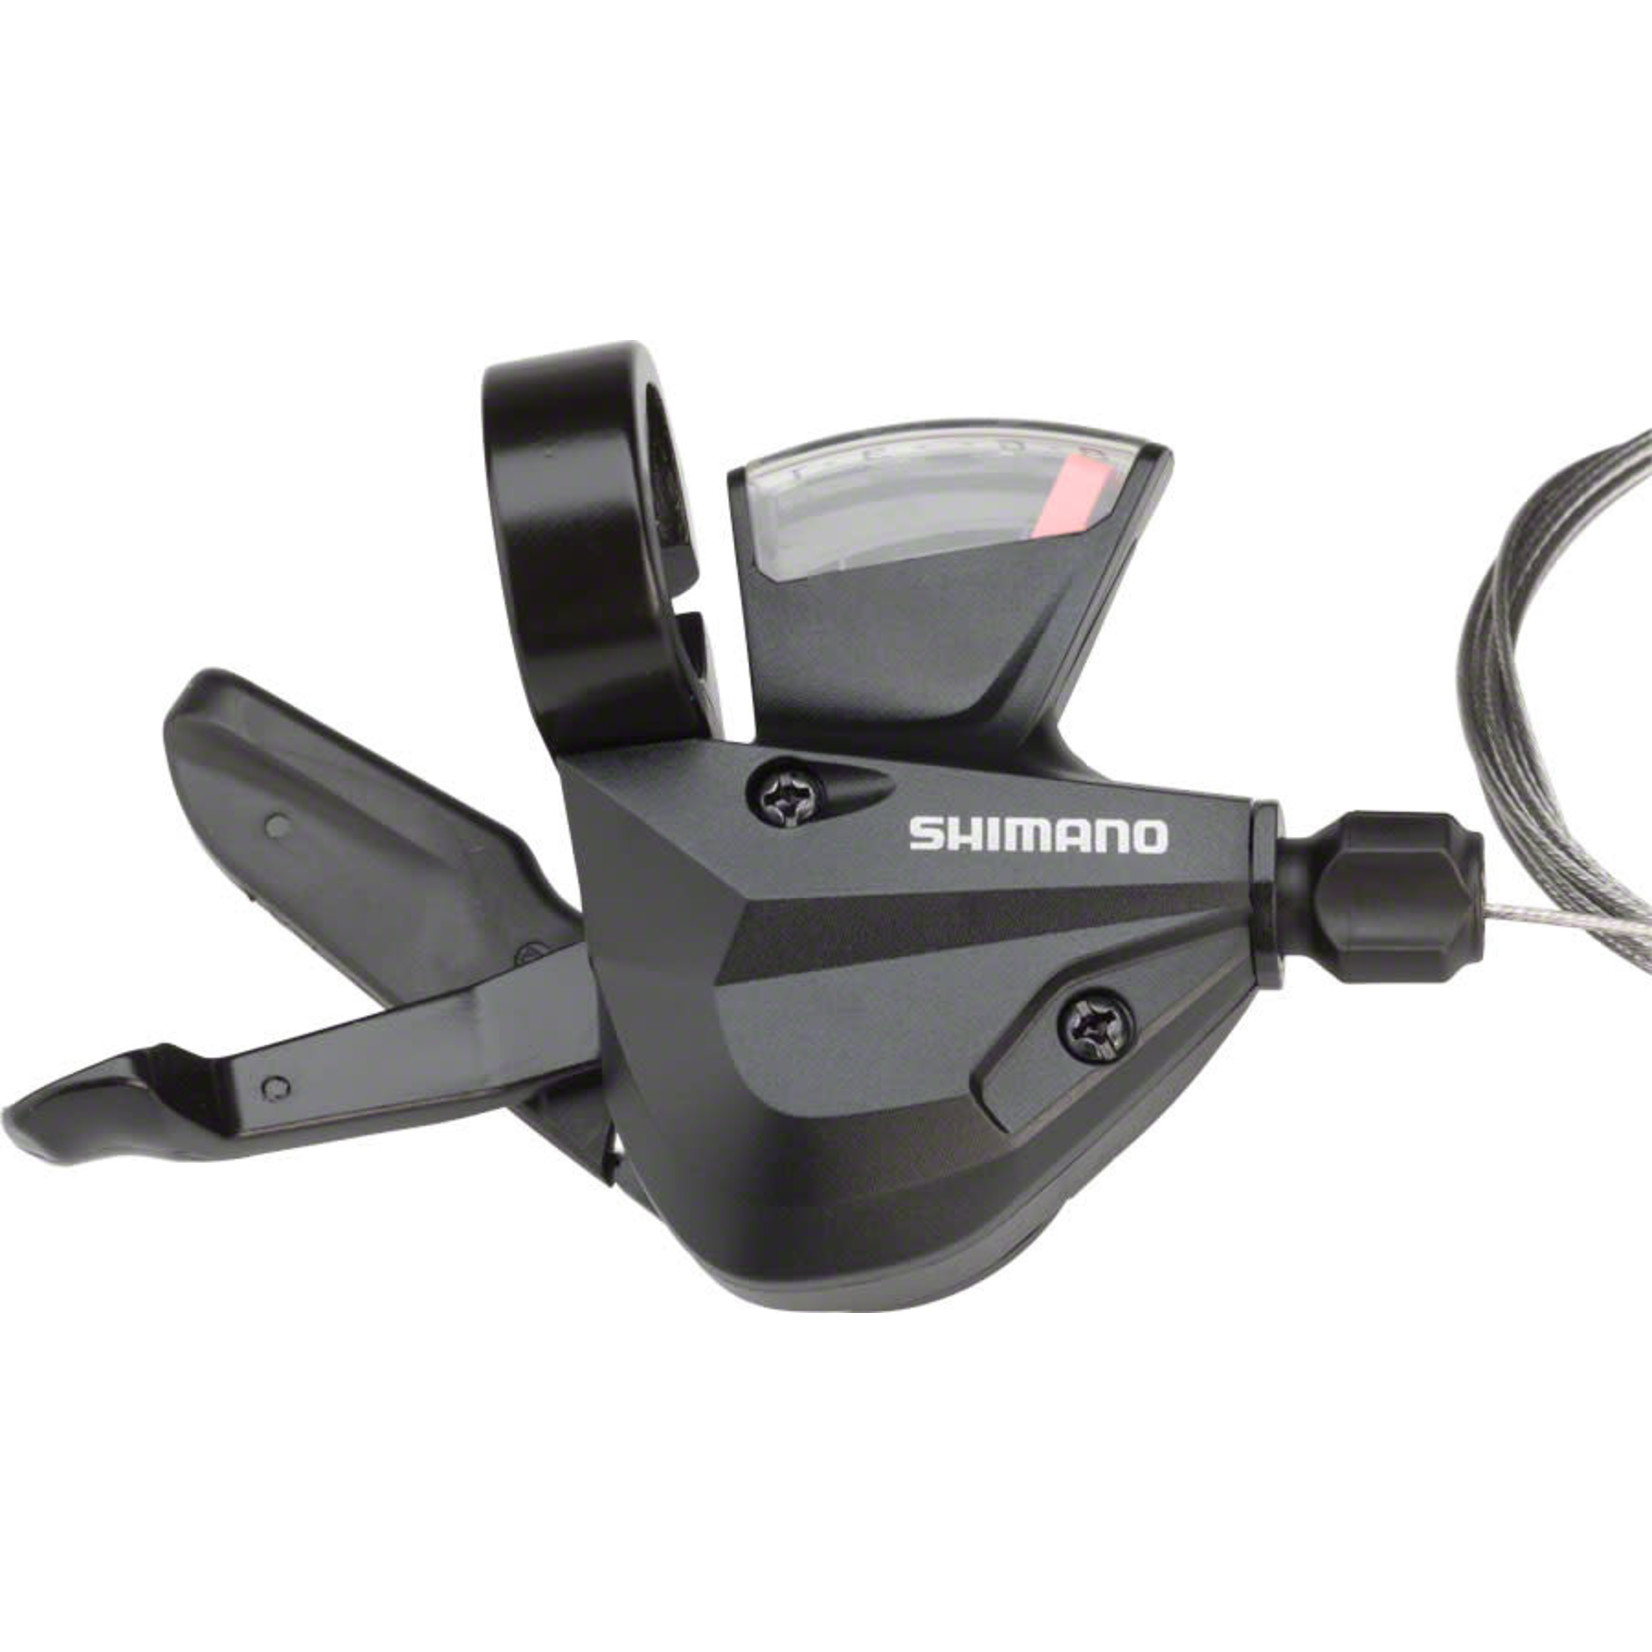 Shimano Shimano Altus 8-Speed Right Trigger Shifter SL - M310